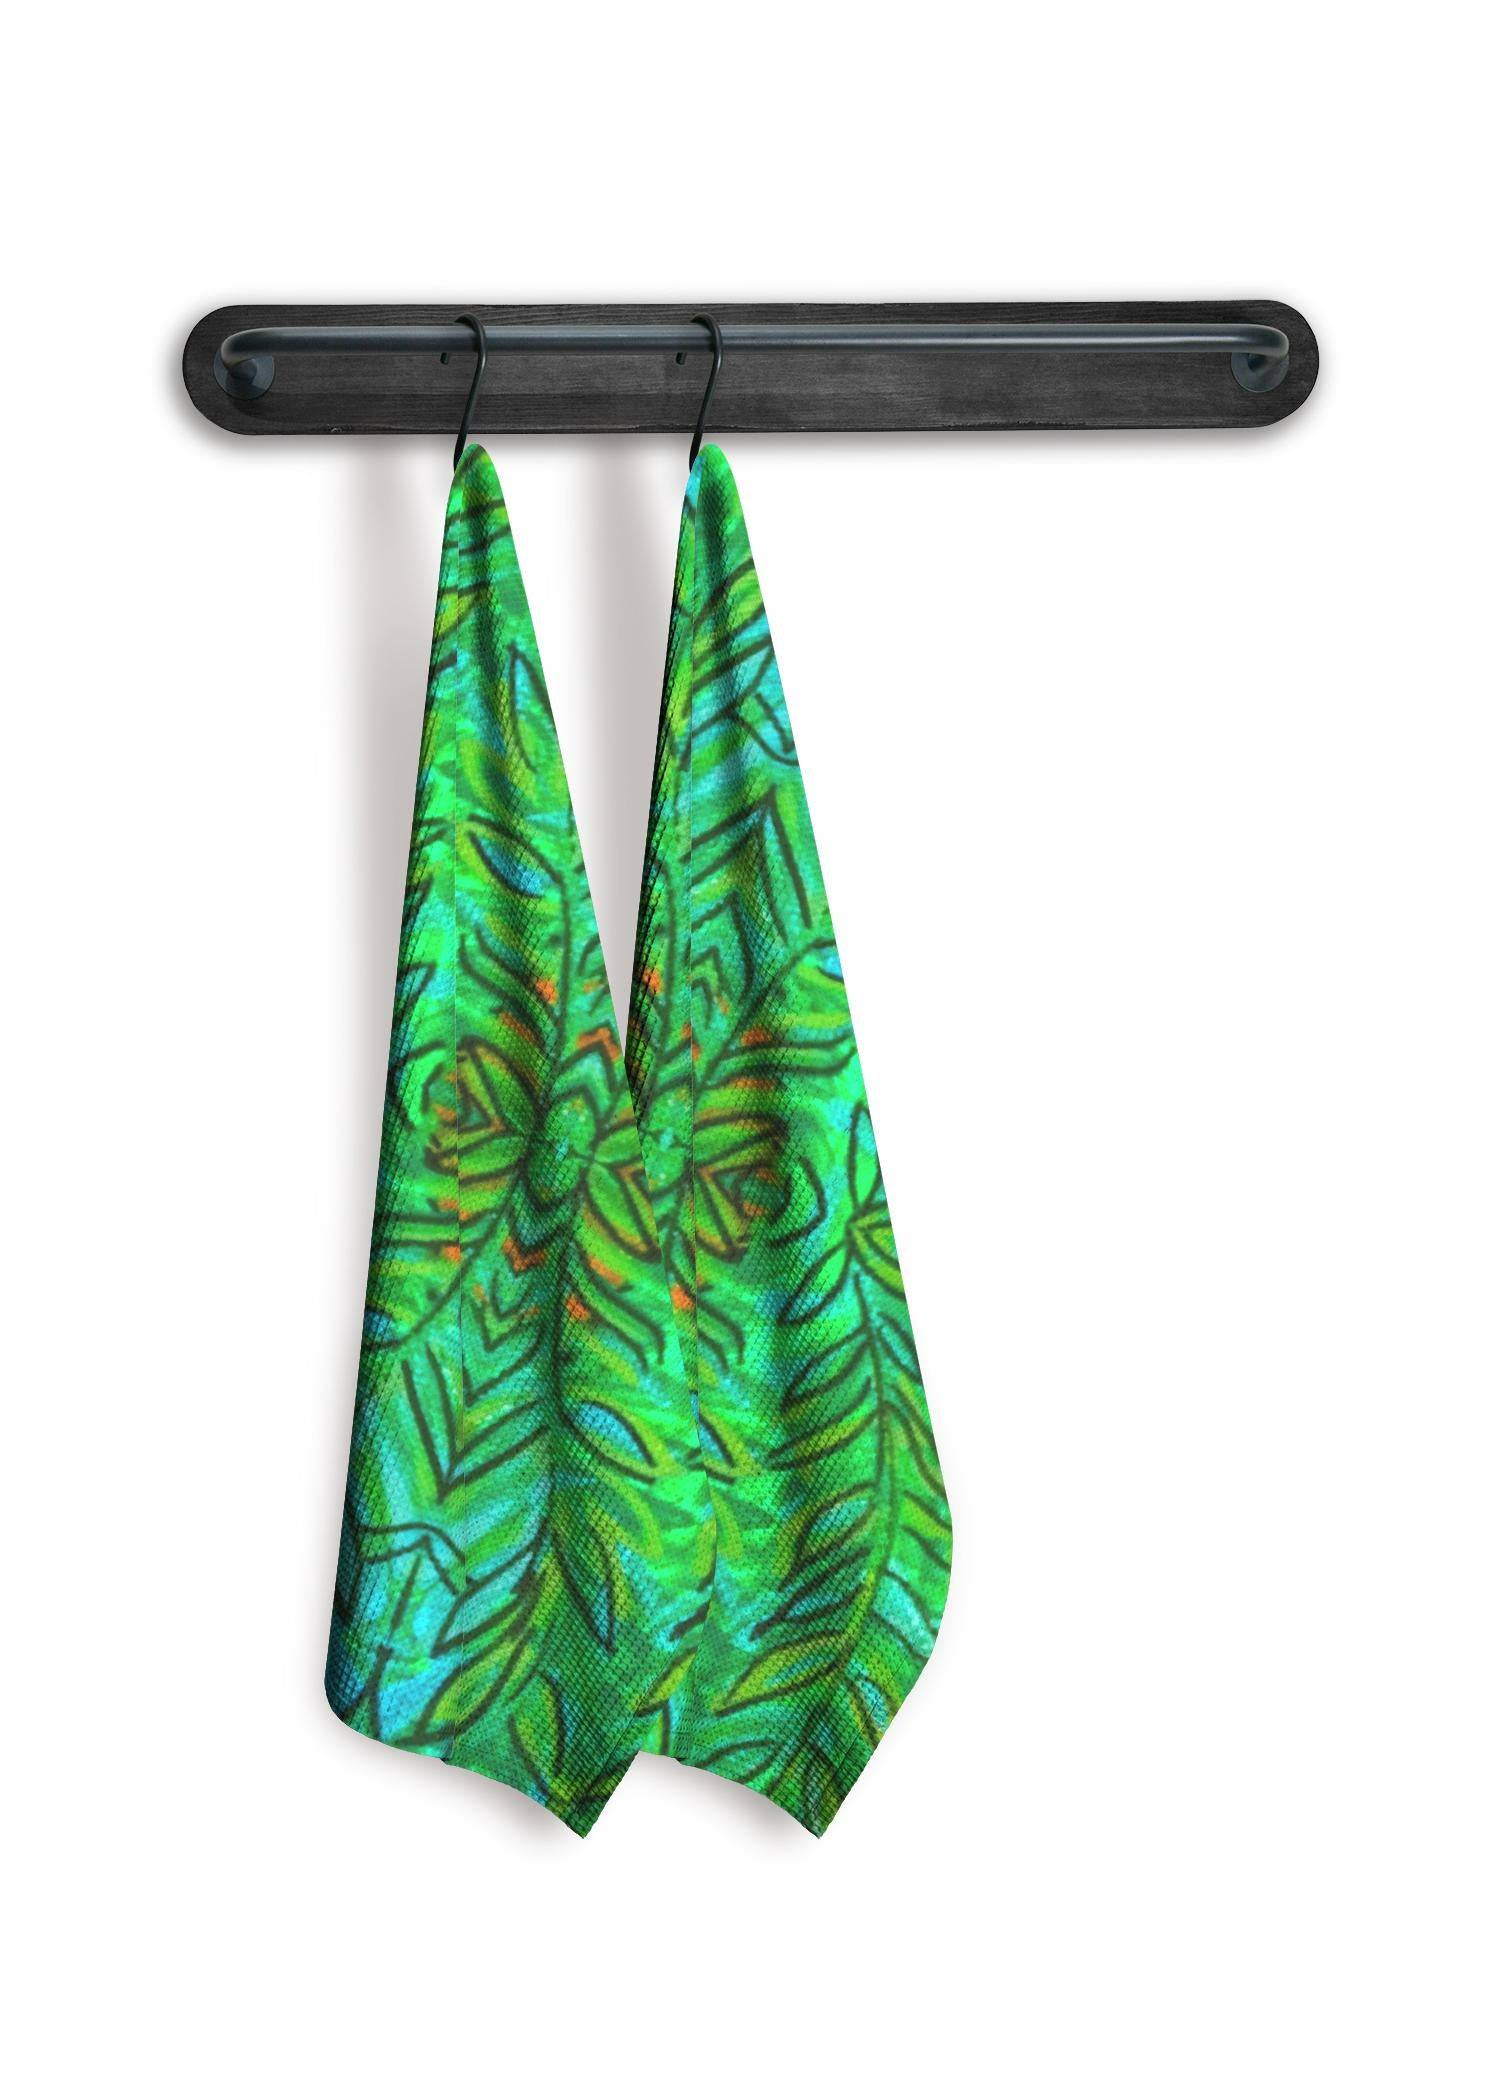 VIDA Tea Towel Set of 2 - Fern Garden by VIDA Original Artist  - Size: Mixed set